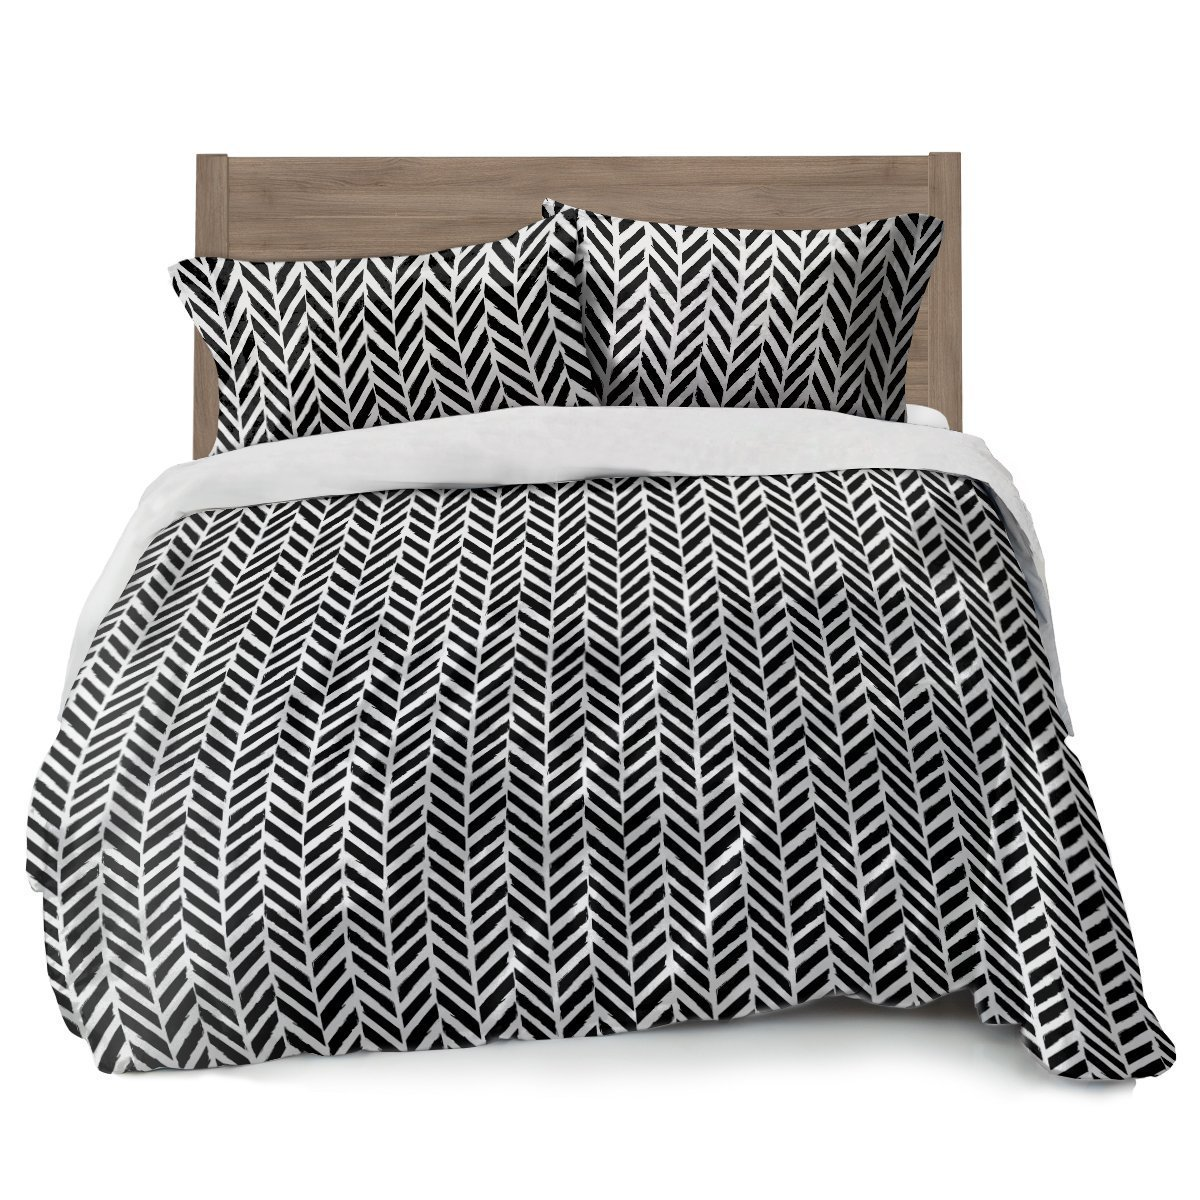 Full Queen Black and White Duvet Cover Herringbone Design w/ 2 Pillowcases by Where The Polka Dots Roam